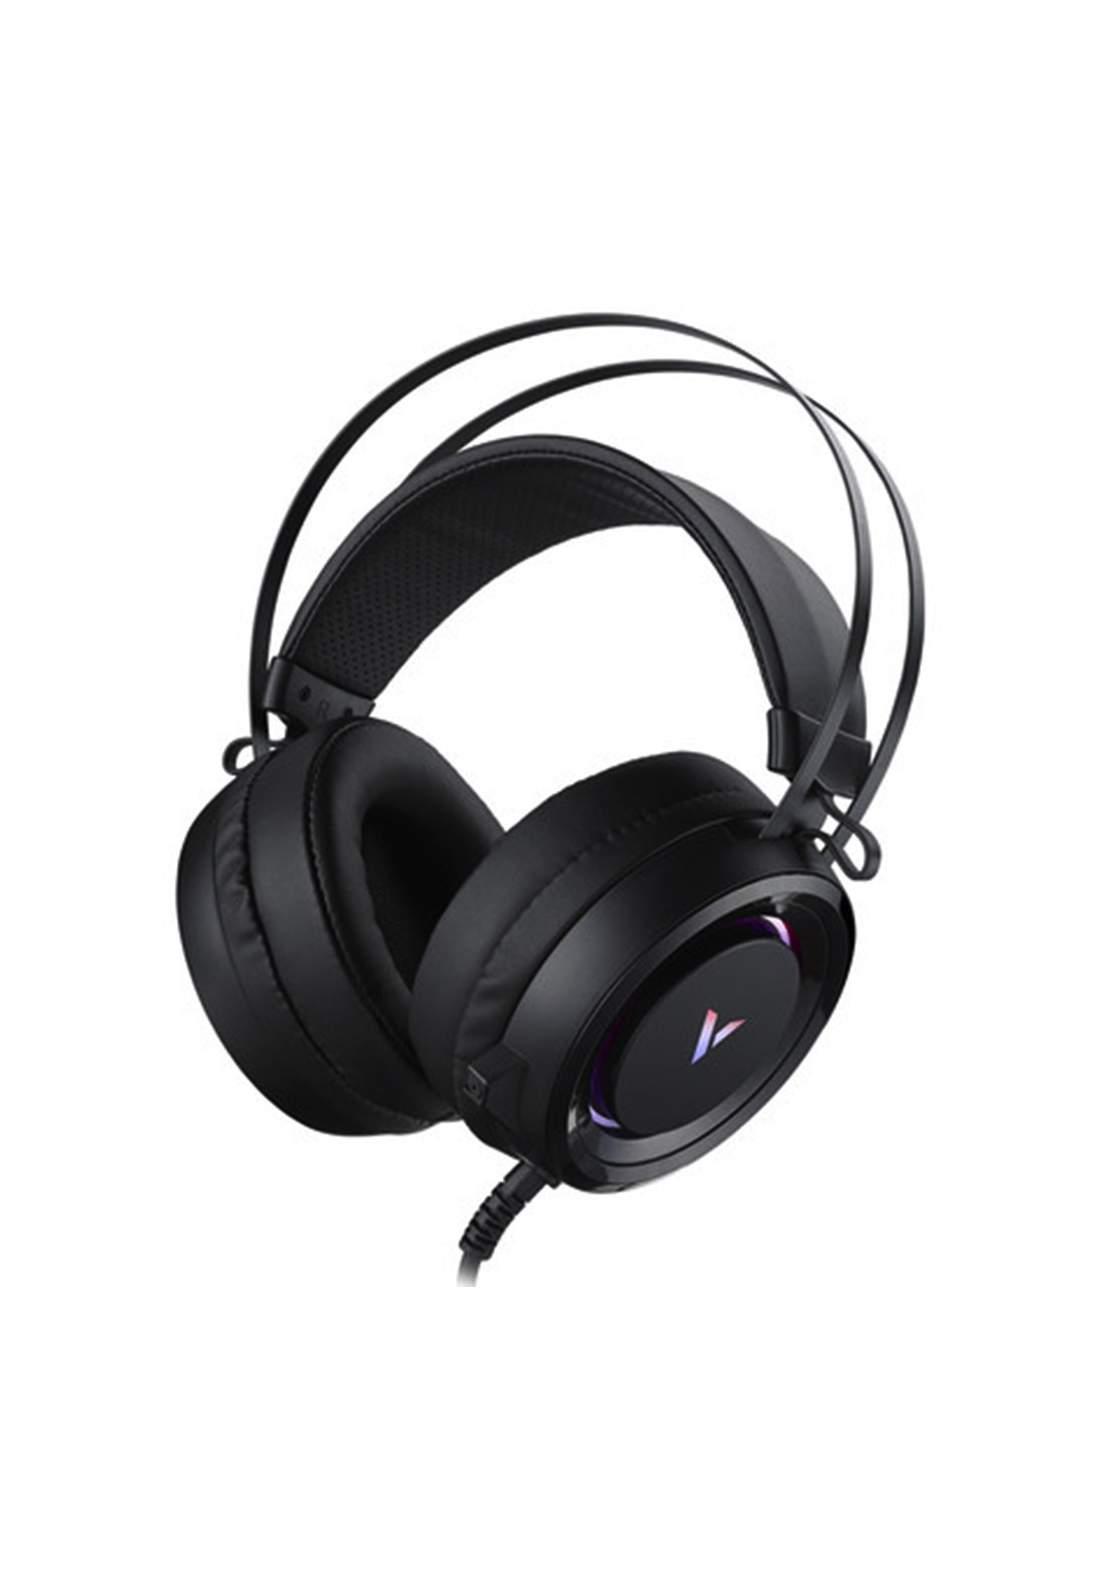 Rapoo VH500C Wired Gaming Headset - Black سماعة سلكية